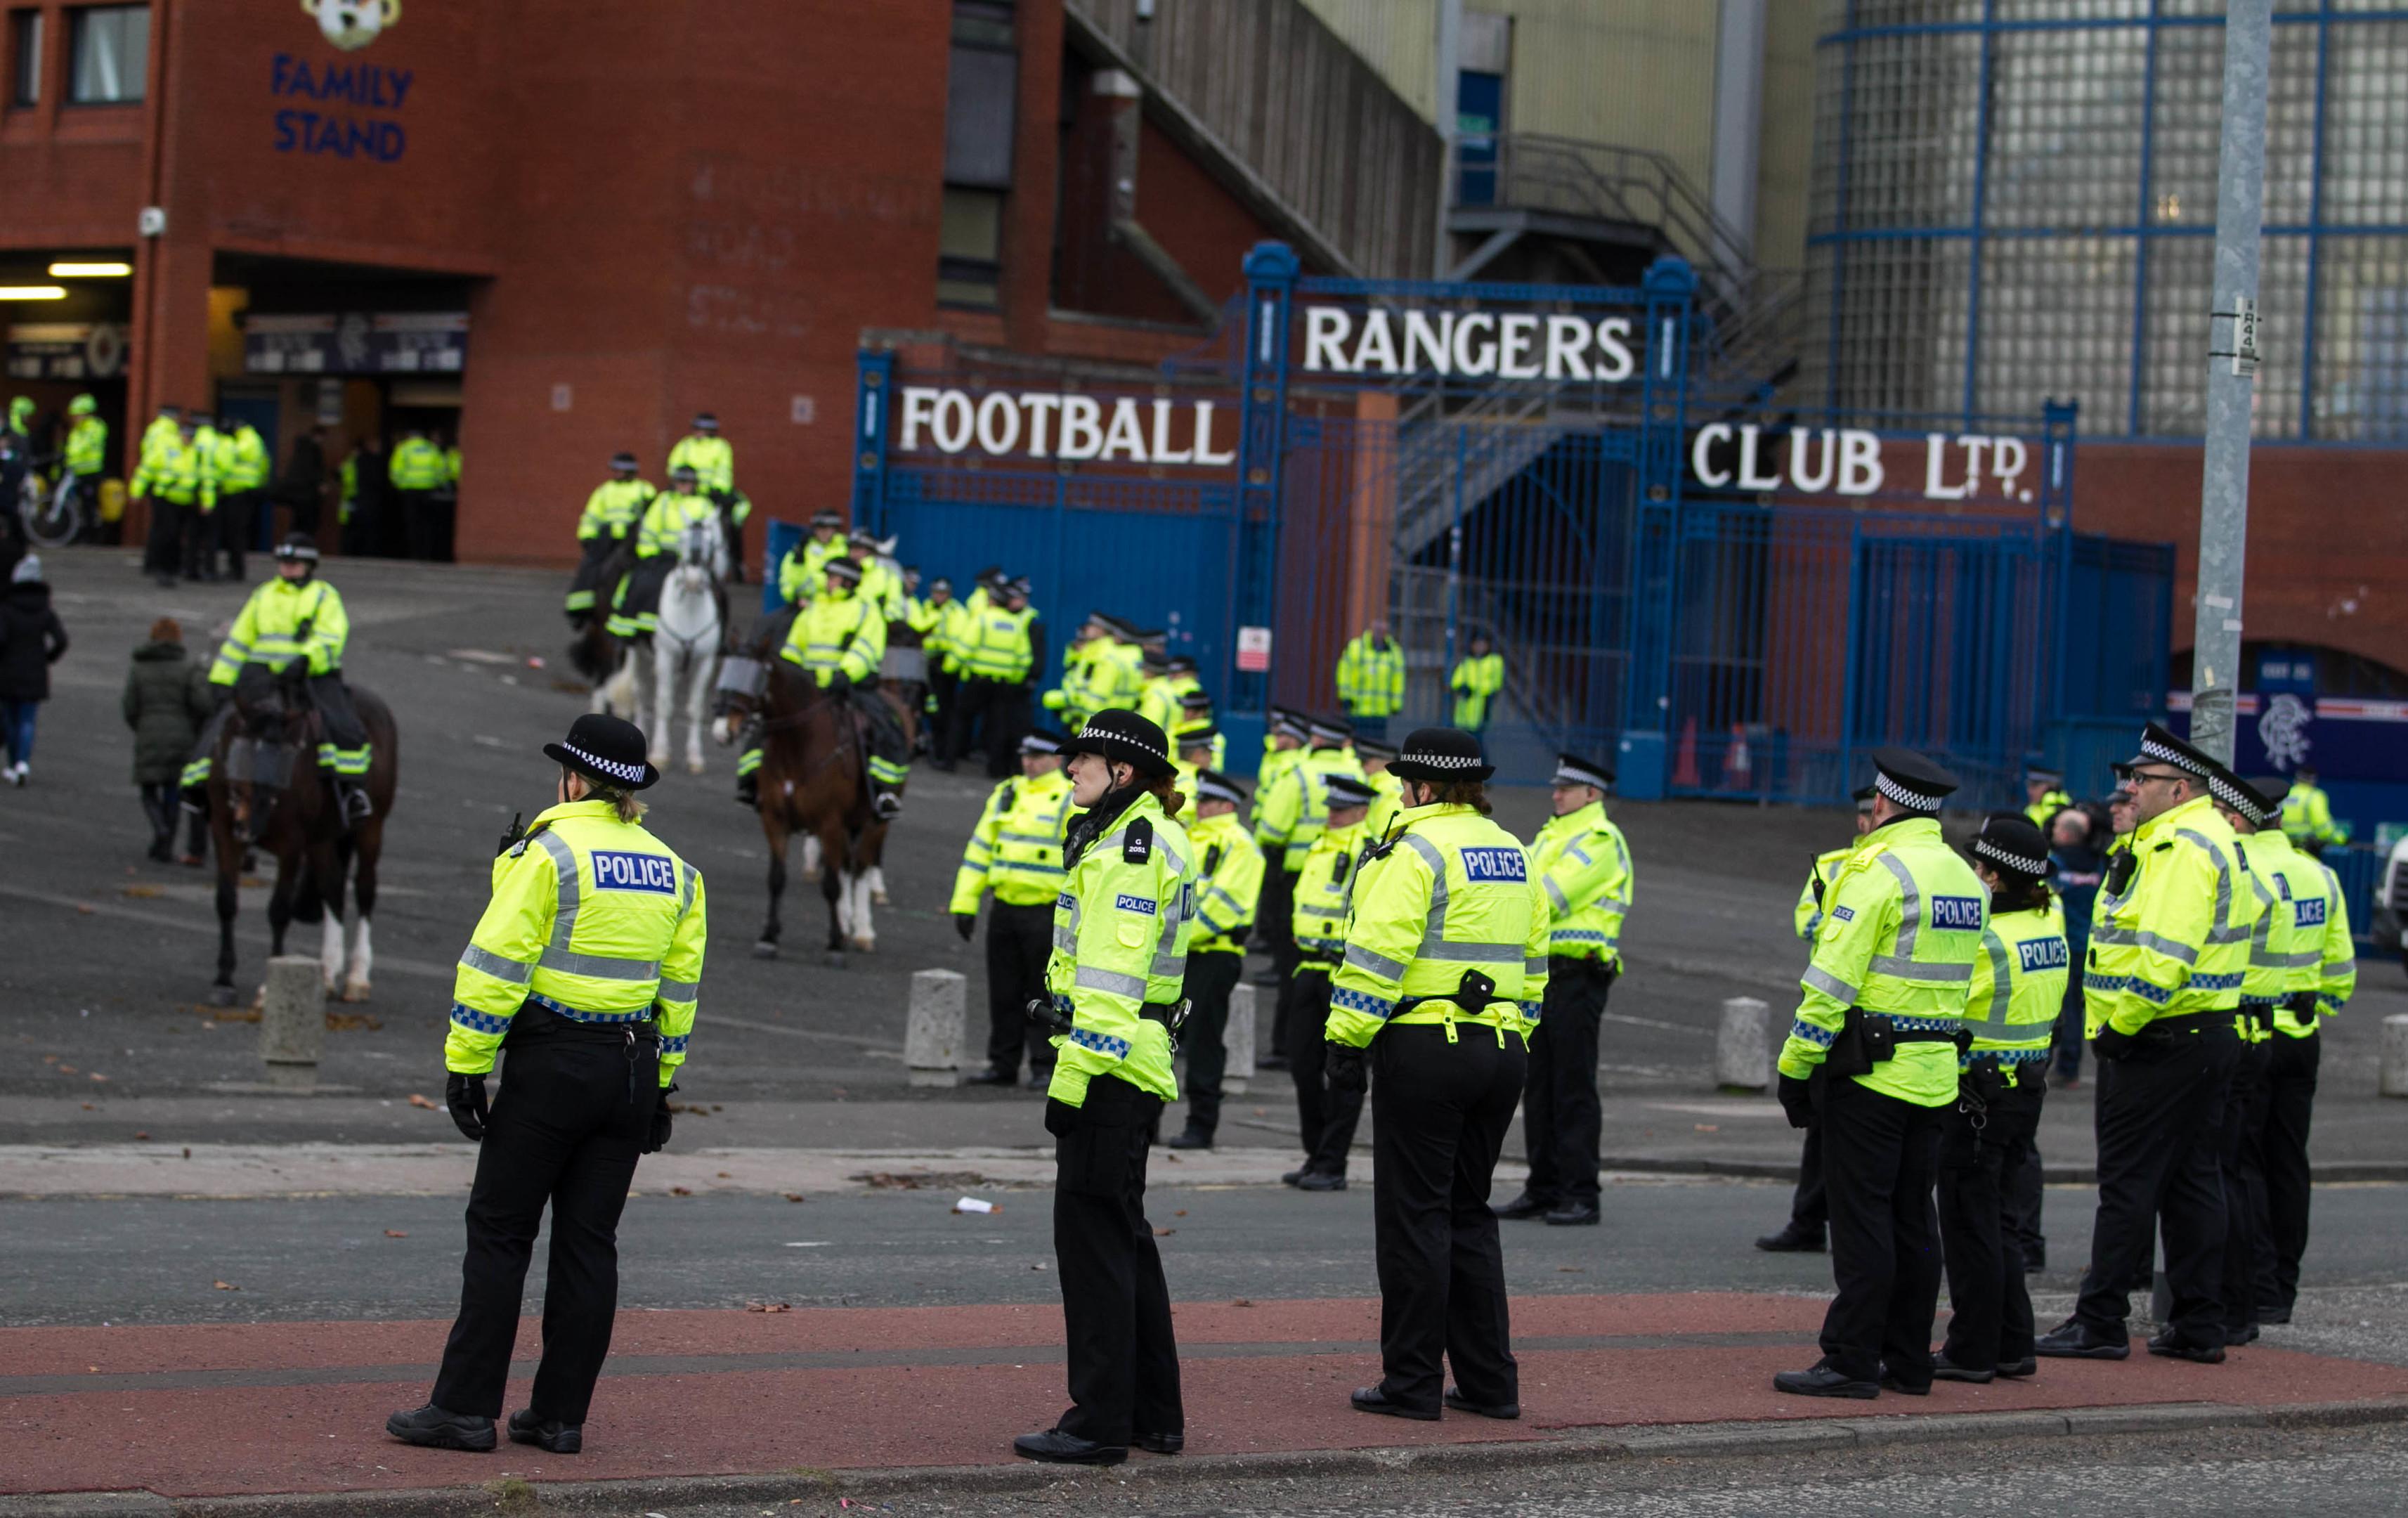 Police at Ibrox (Chris Austin / DC Thomson)